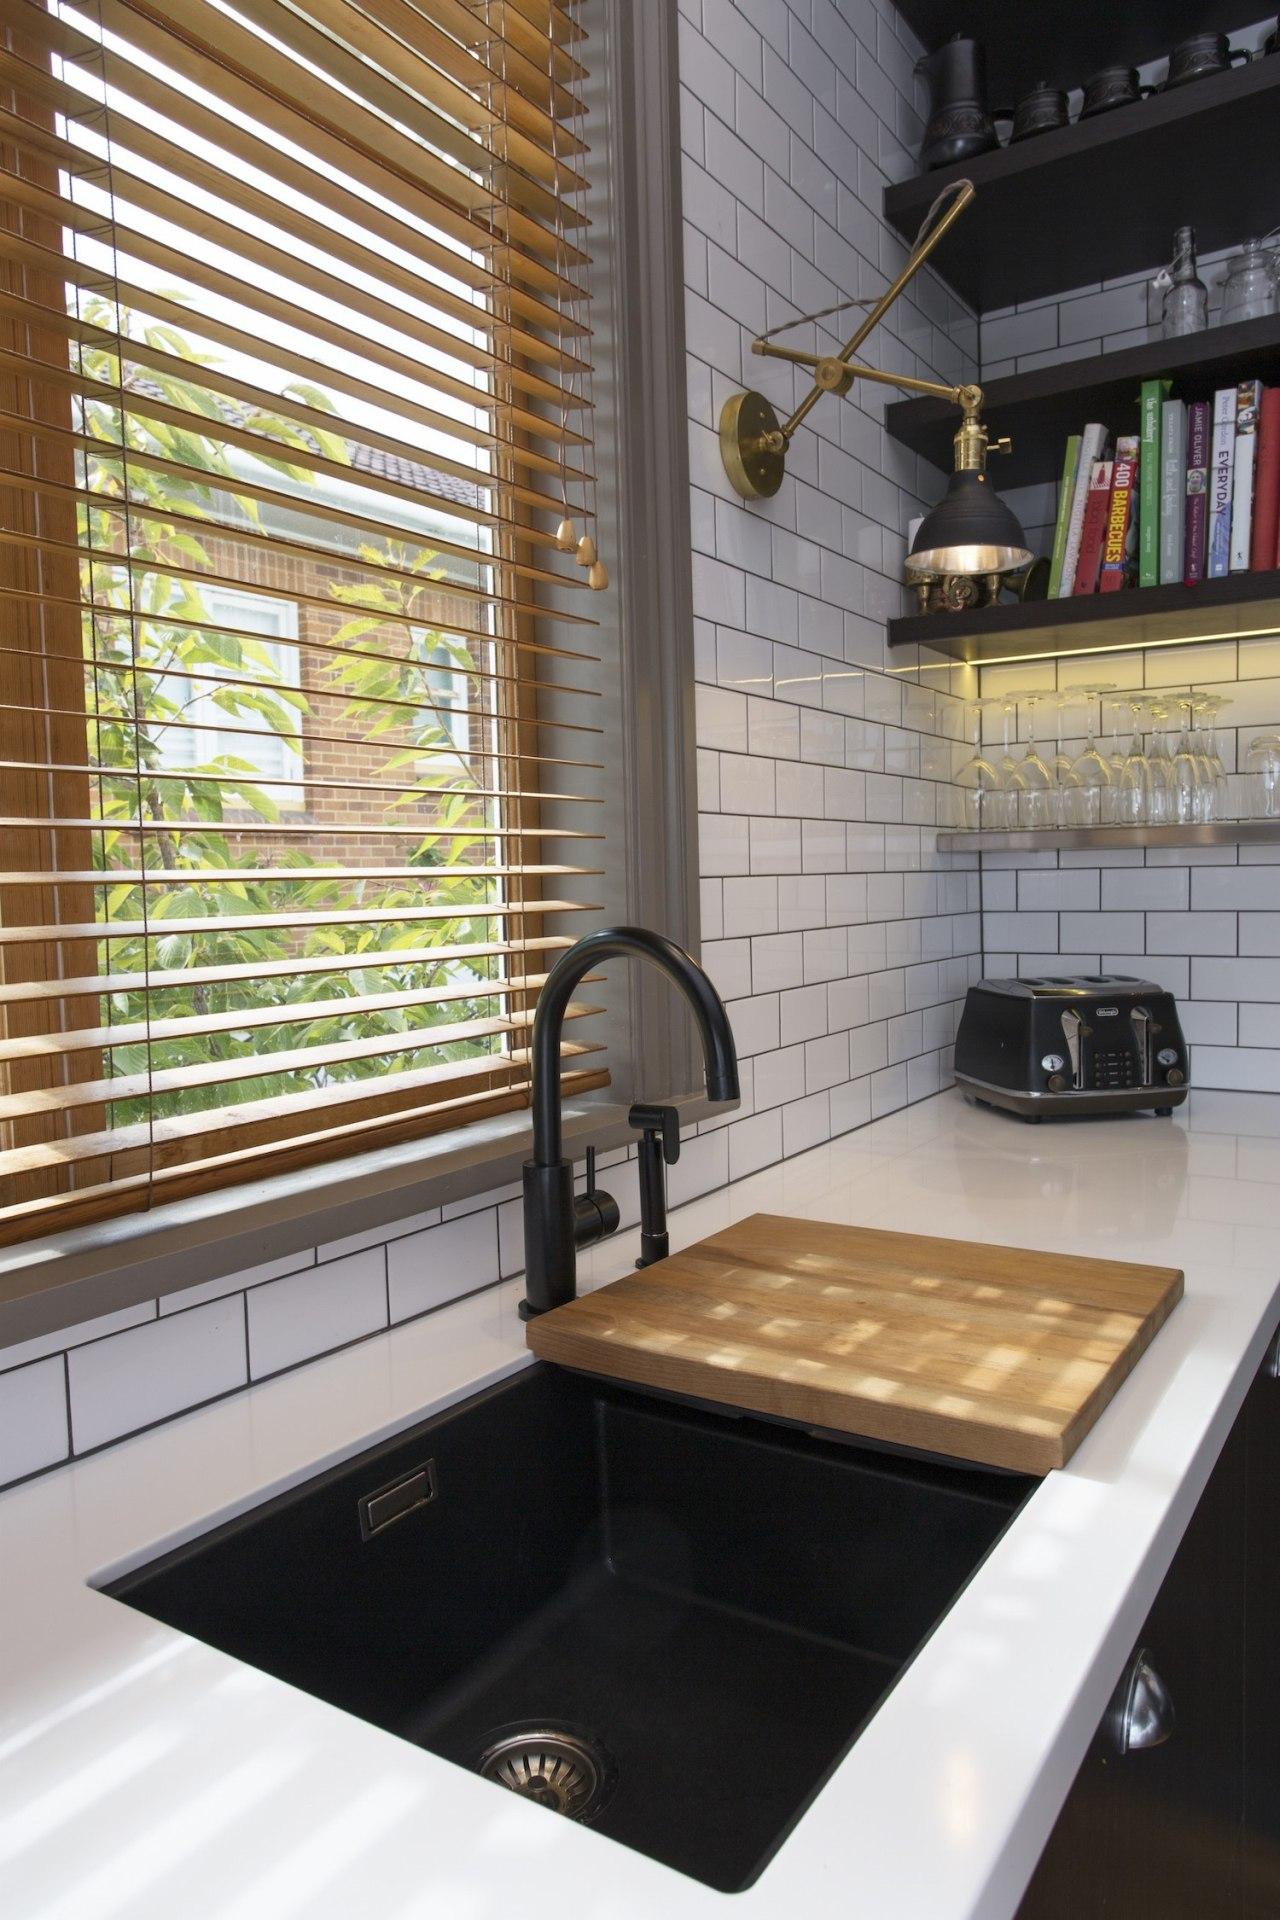 TIDA NZ 2017 – Designer kitchen entrant – countertop, flooring, interior design, kitchen, room, sink, tile, gray